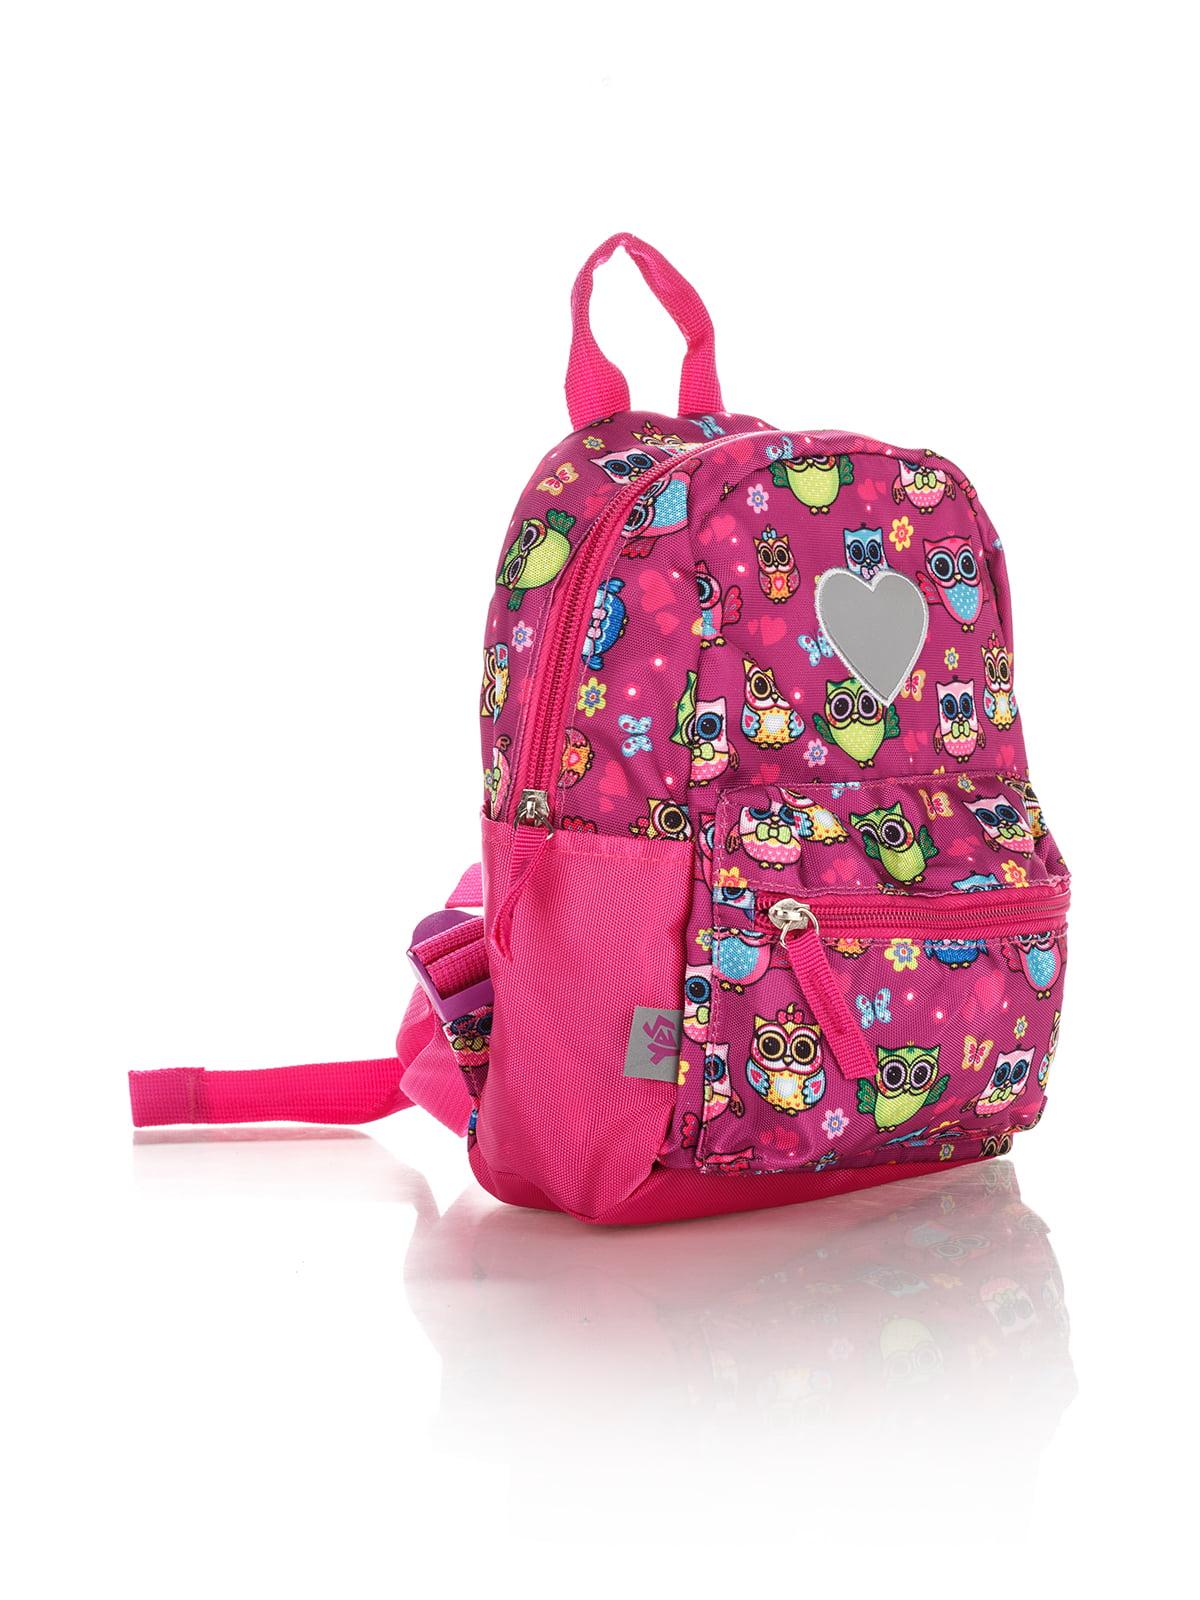 Рюкзак рожевий в принт | 4284719 | фото 3